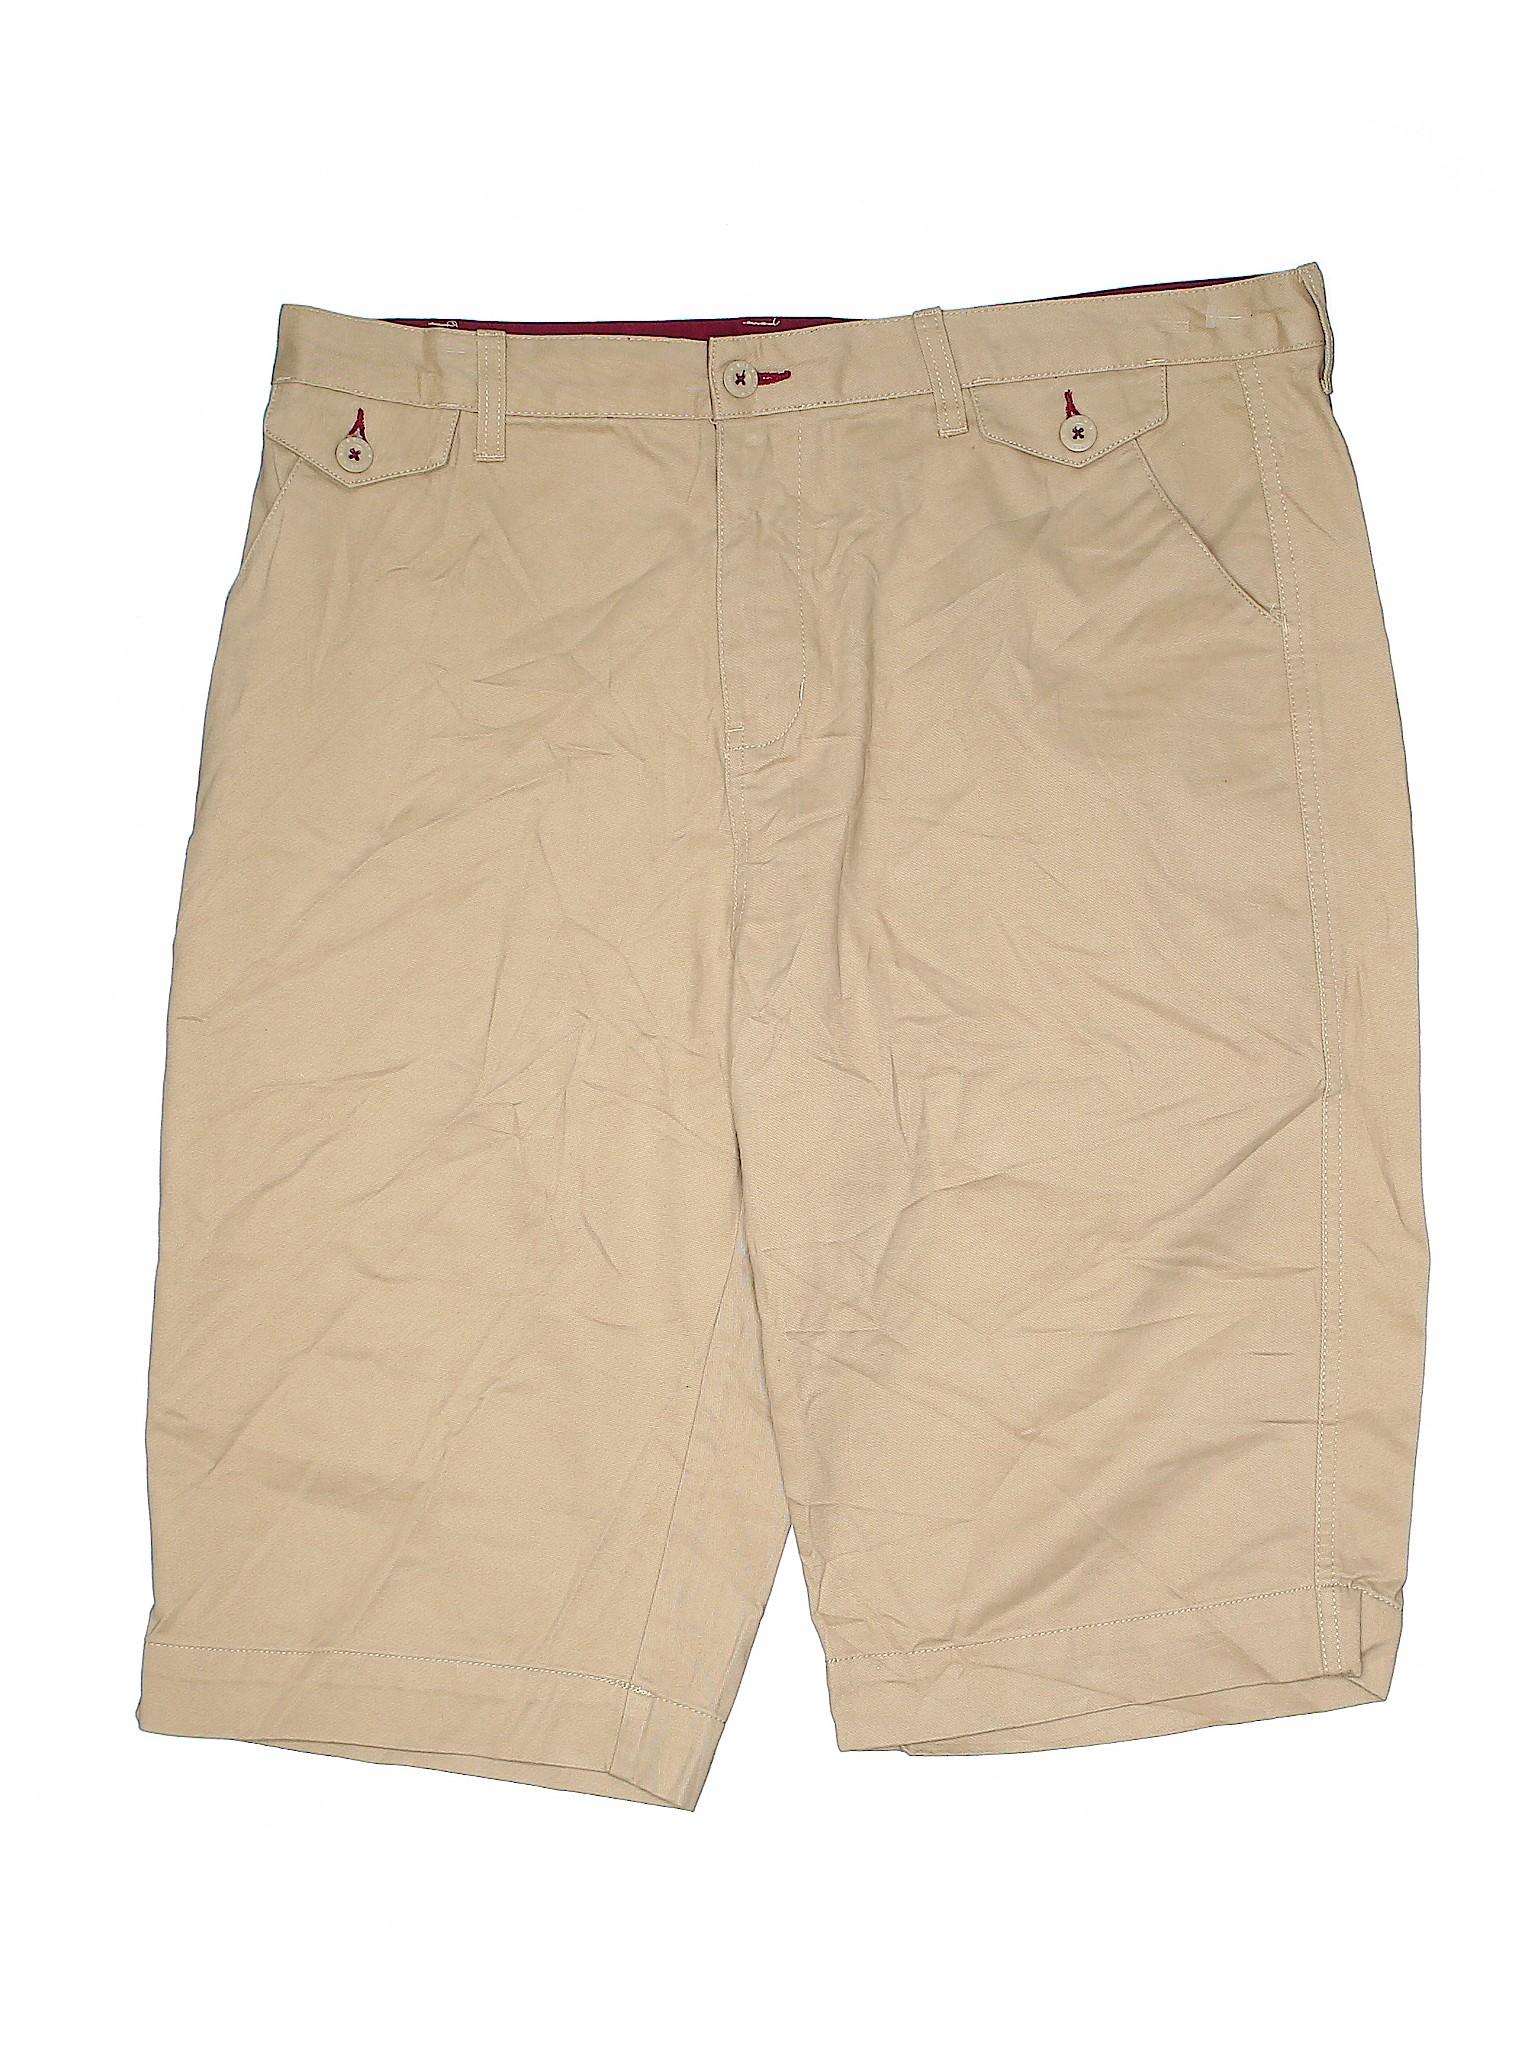 Bill Shorts Khaki Boutique Bill Blass Boutique OzcER7qE